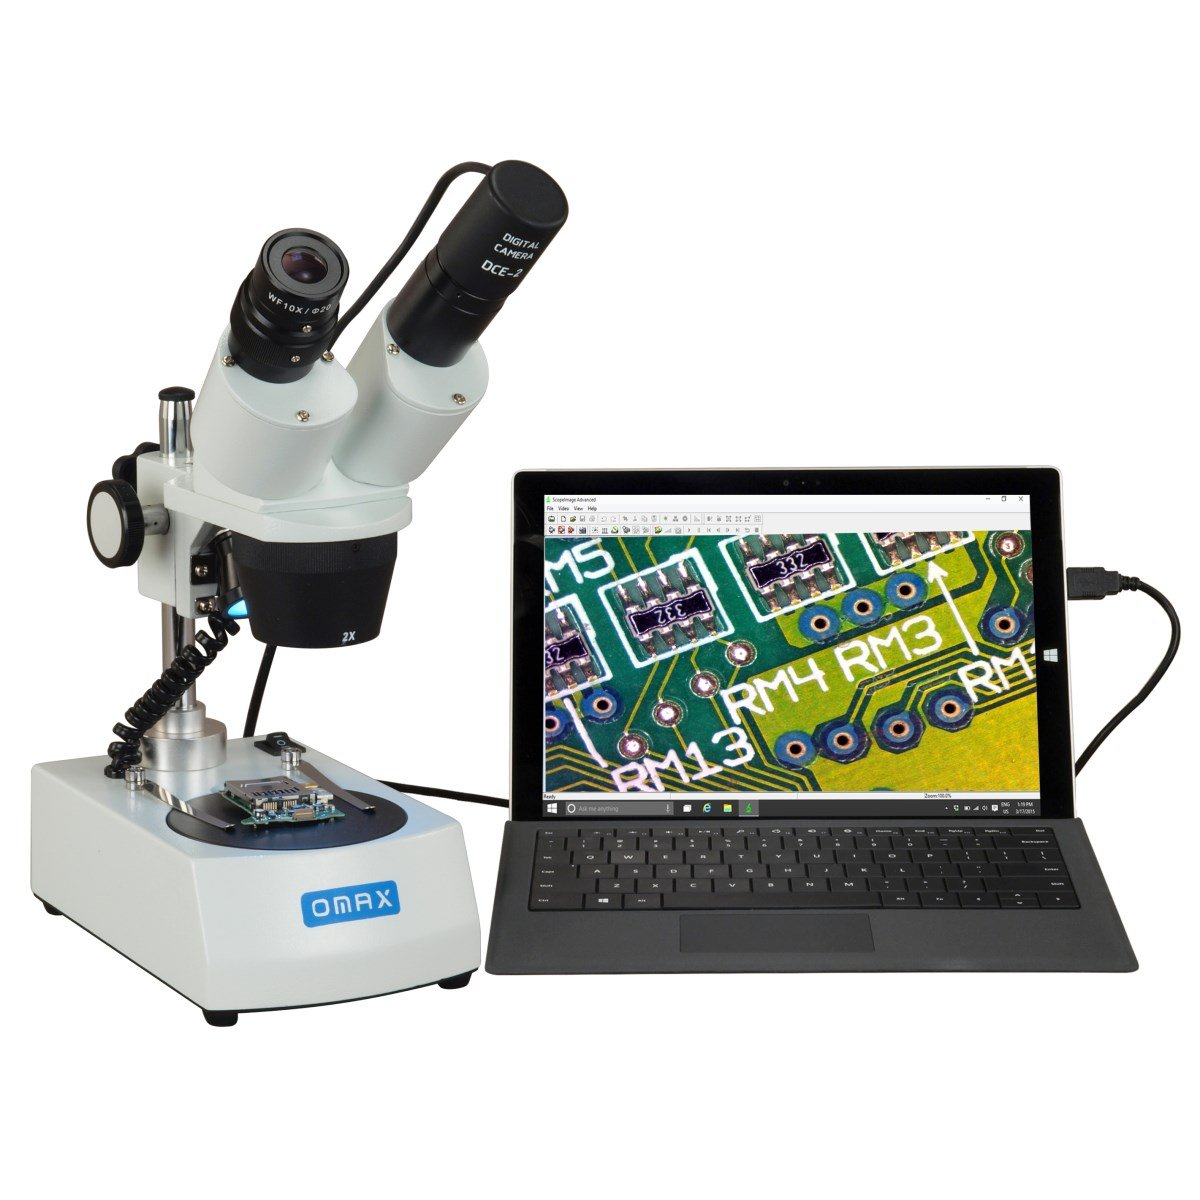 OMAX 20X-40X Cordless Dual LED Lights Stereo Binocular Microscope with USB Digital Camera G223E-C02